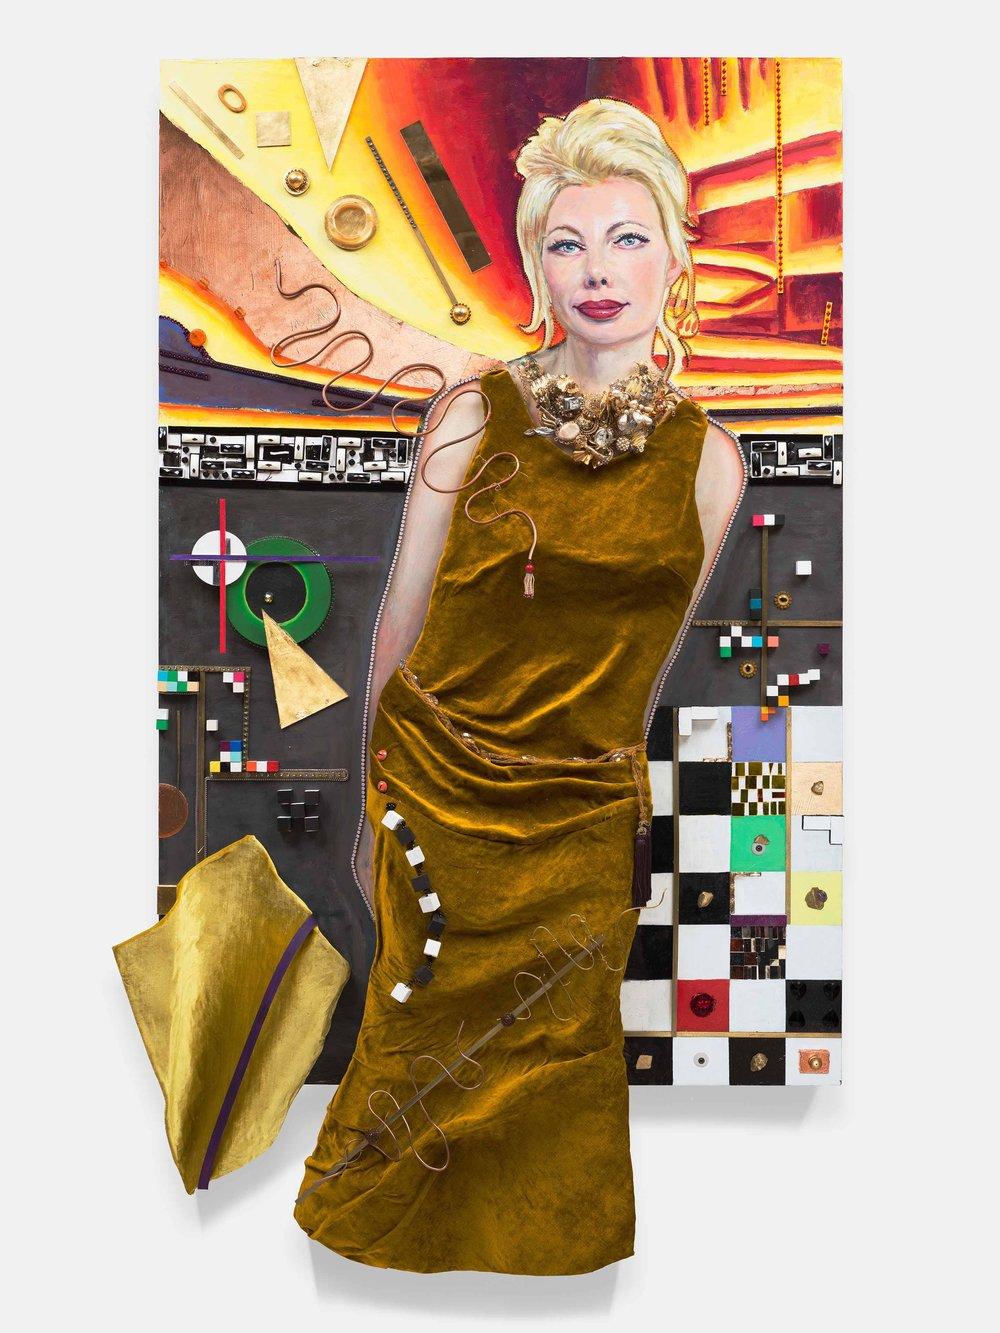 StrosbergMandel-OlgafromRussia-metallic print-18 x 24 in.-$950.jpg